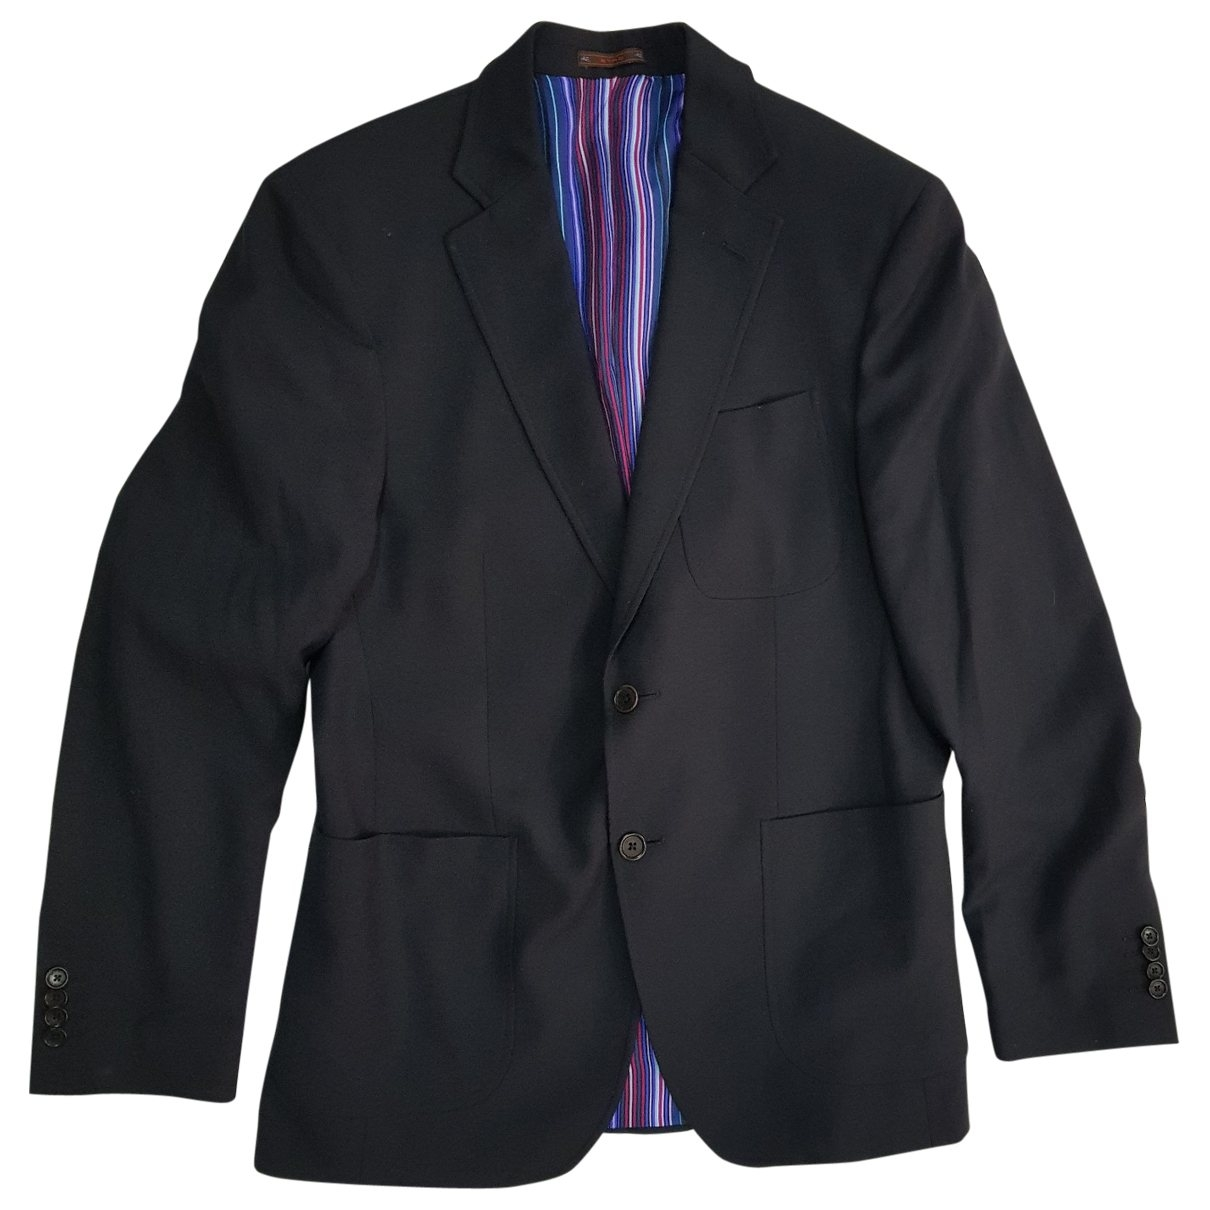 Etro \N Jacke in  Schwarz Wolle